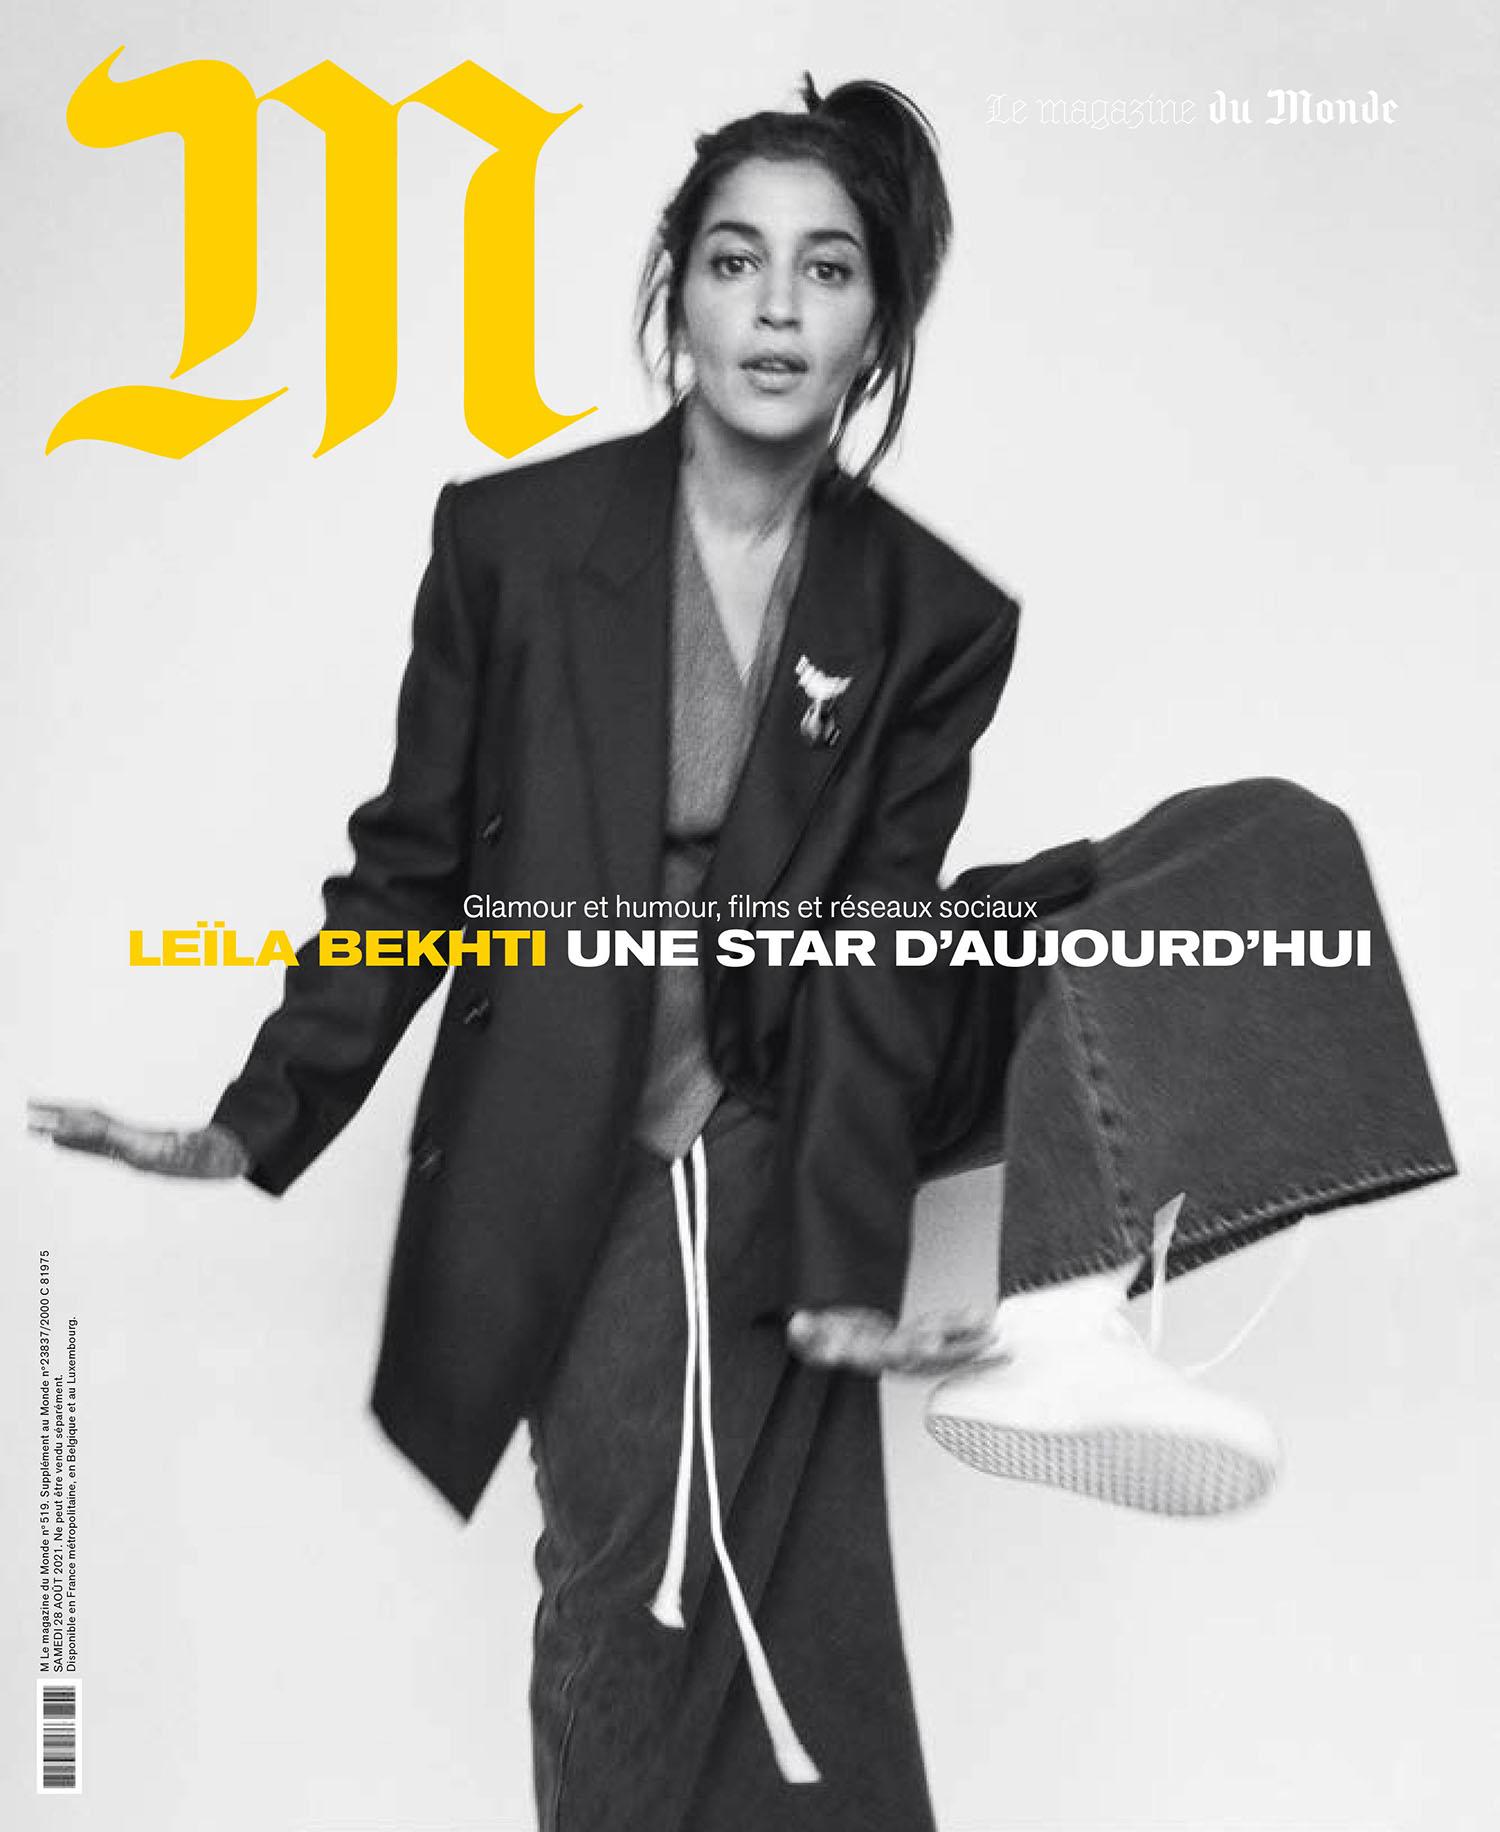 Leïla Bekhti covers M Le magazine du Monde August 28th, 2021 by Matteo Montanari